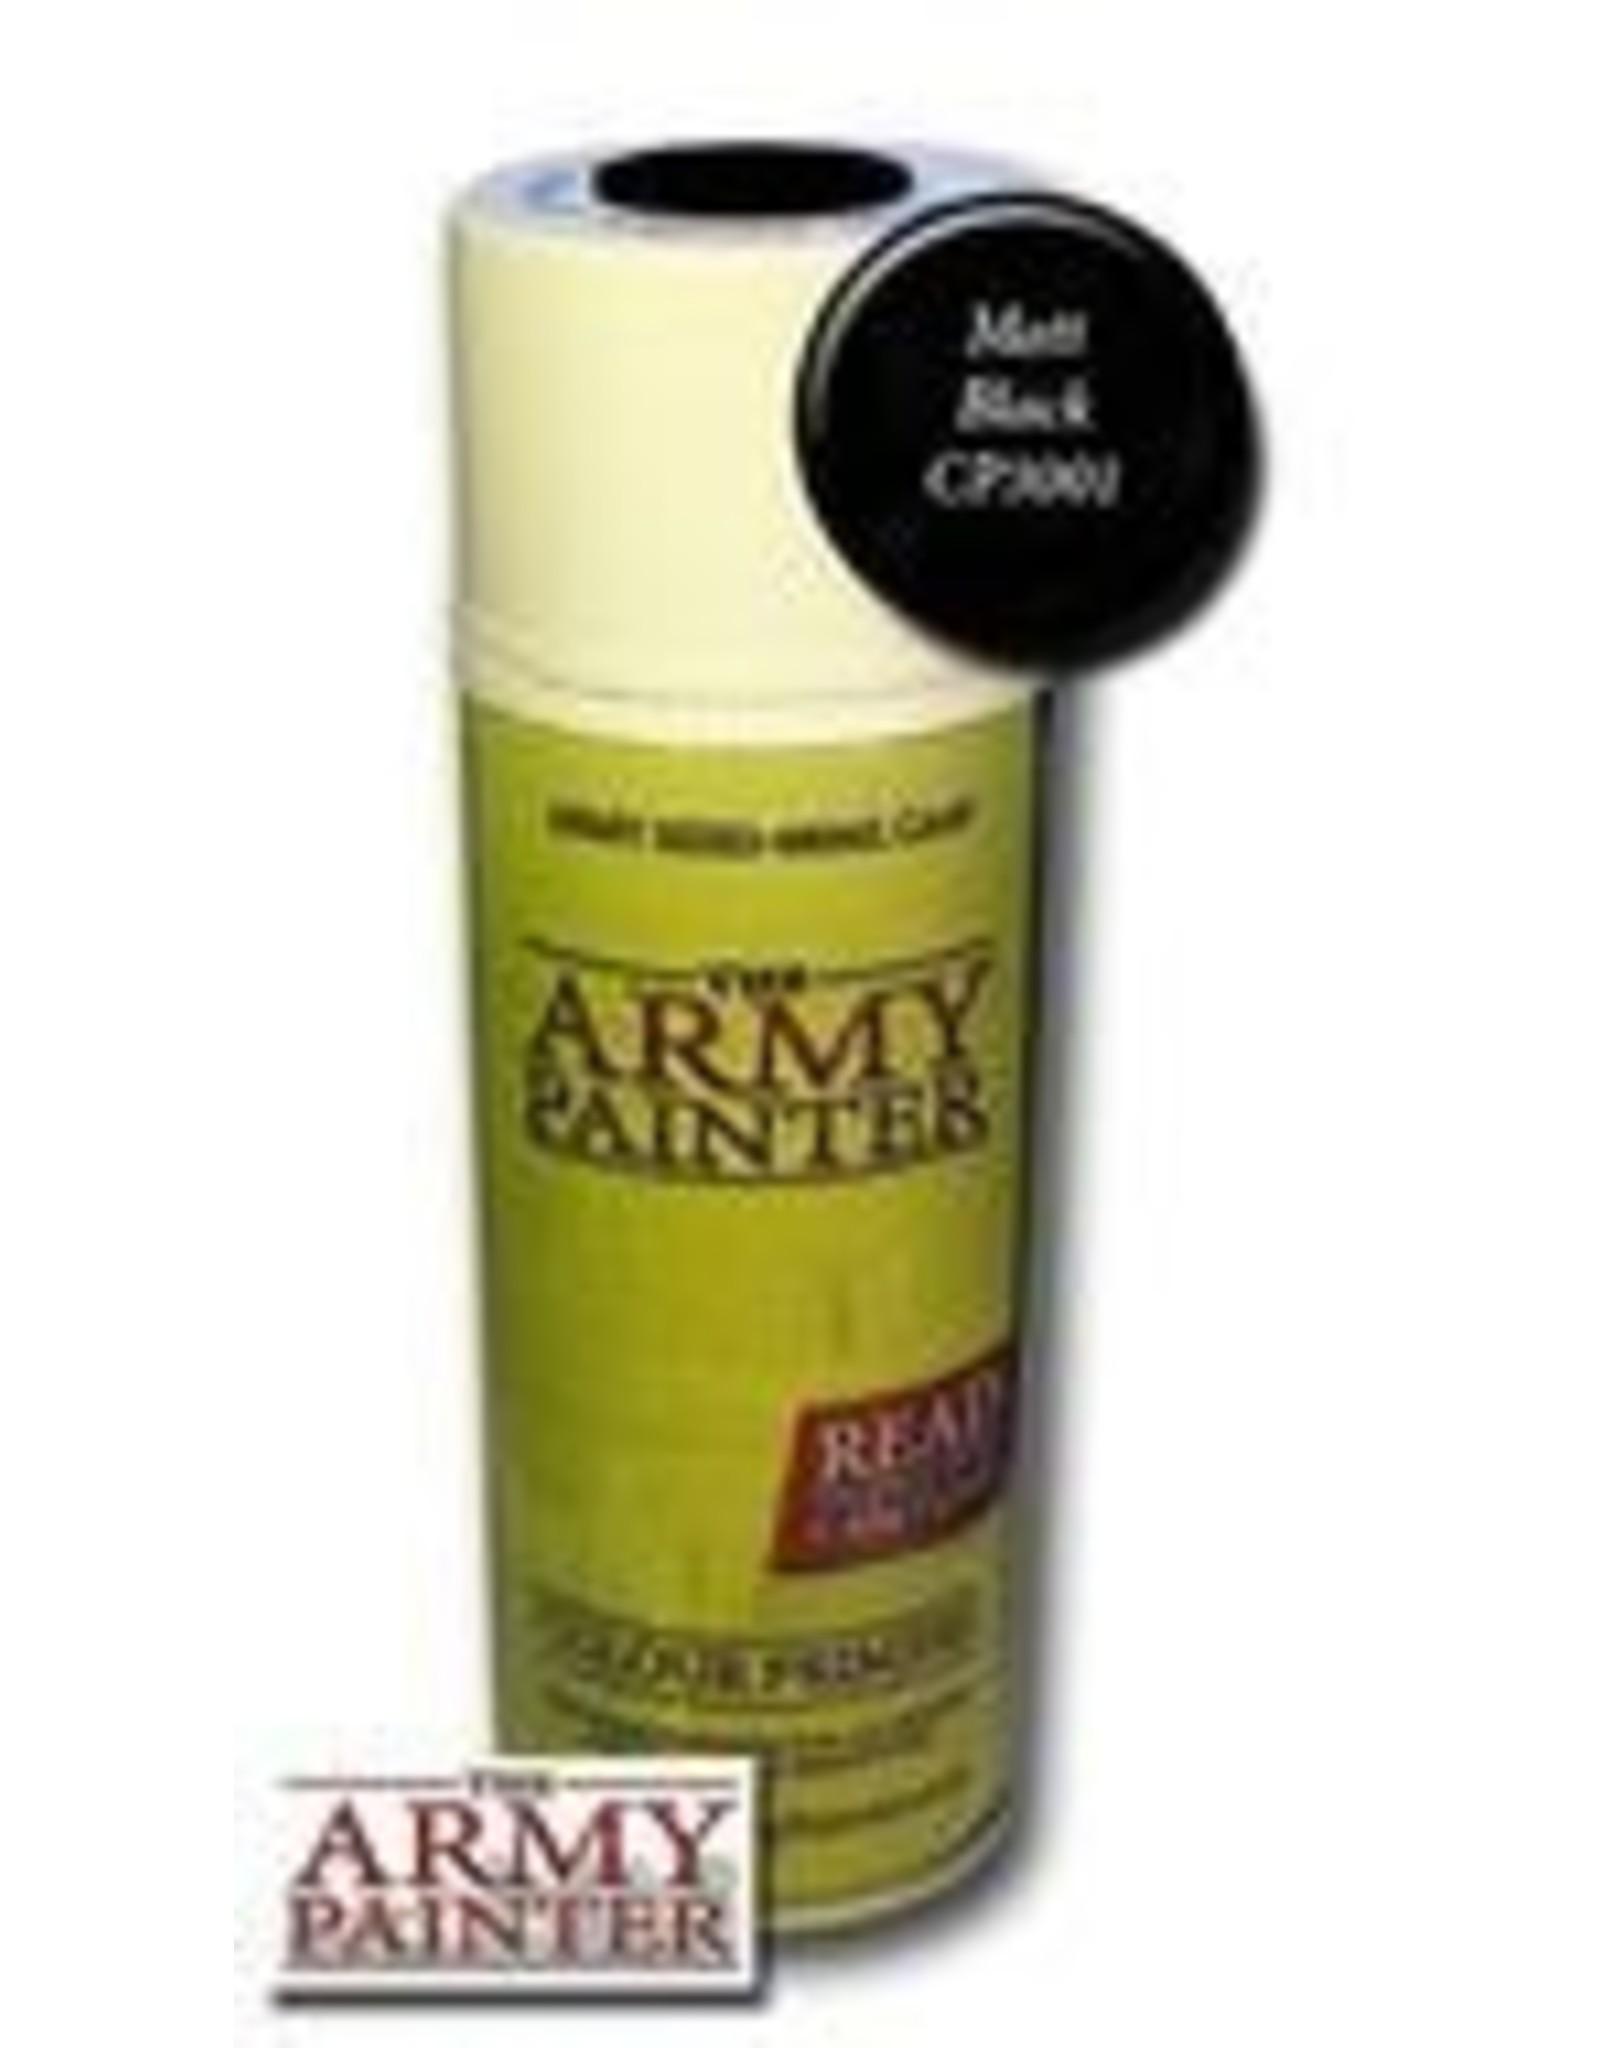 Army Painter Base Primer: Matte Black